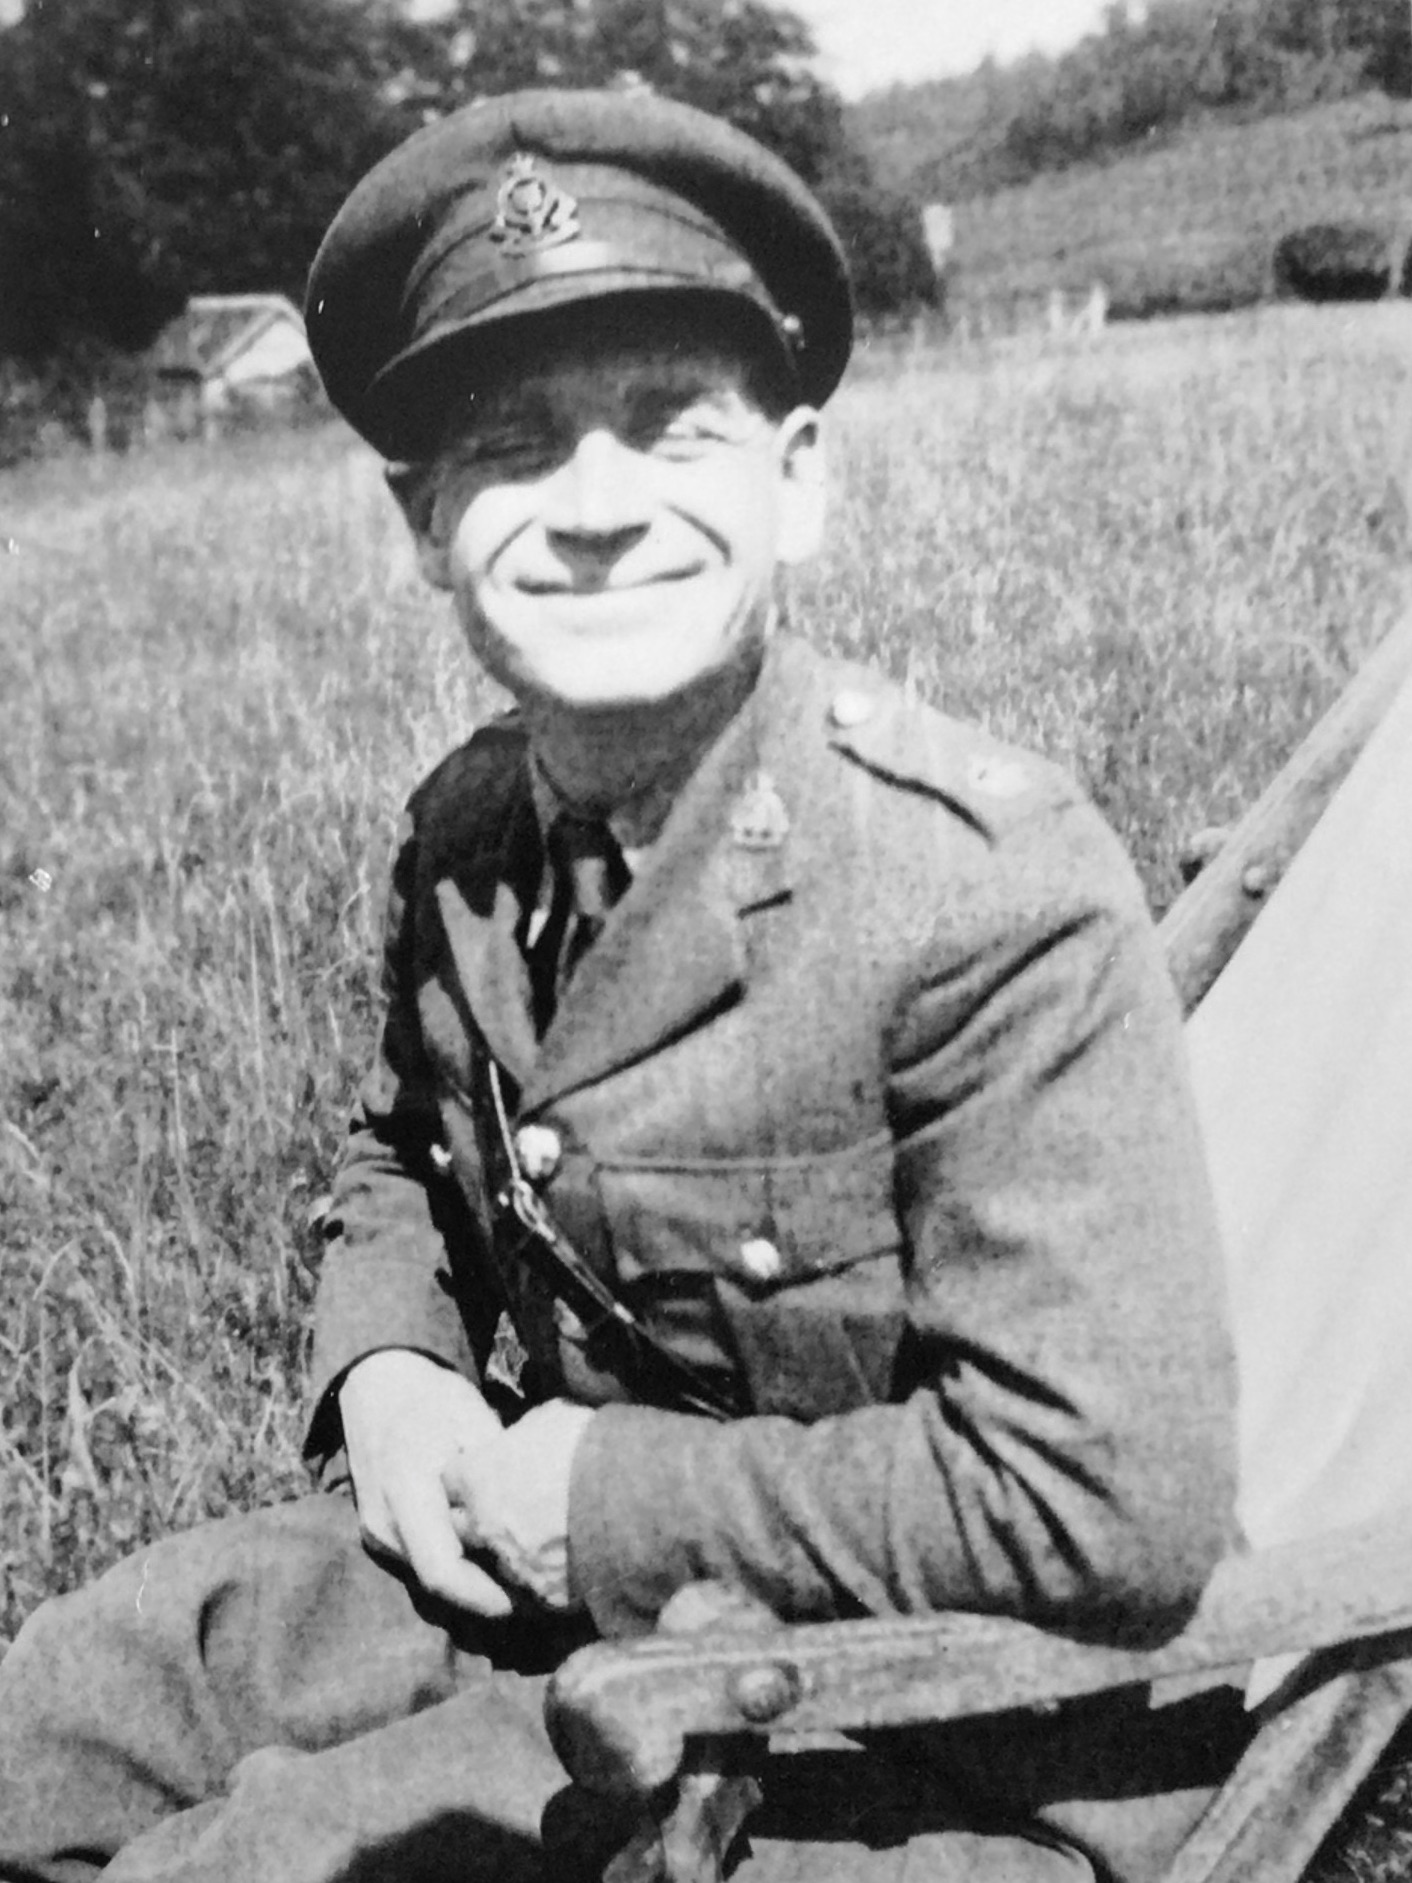 Leslie Amlot in military uniform.